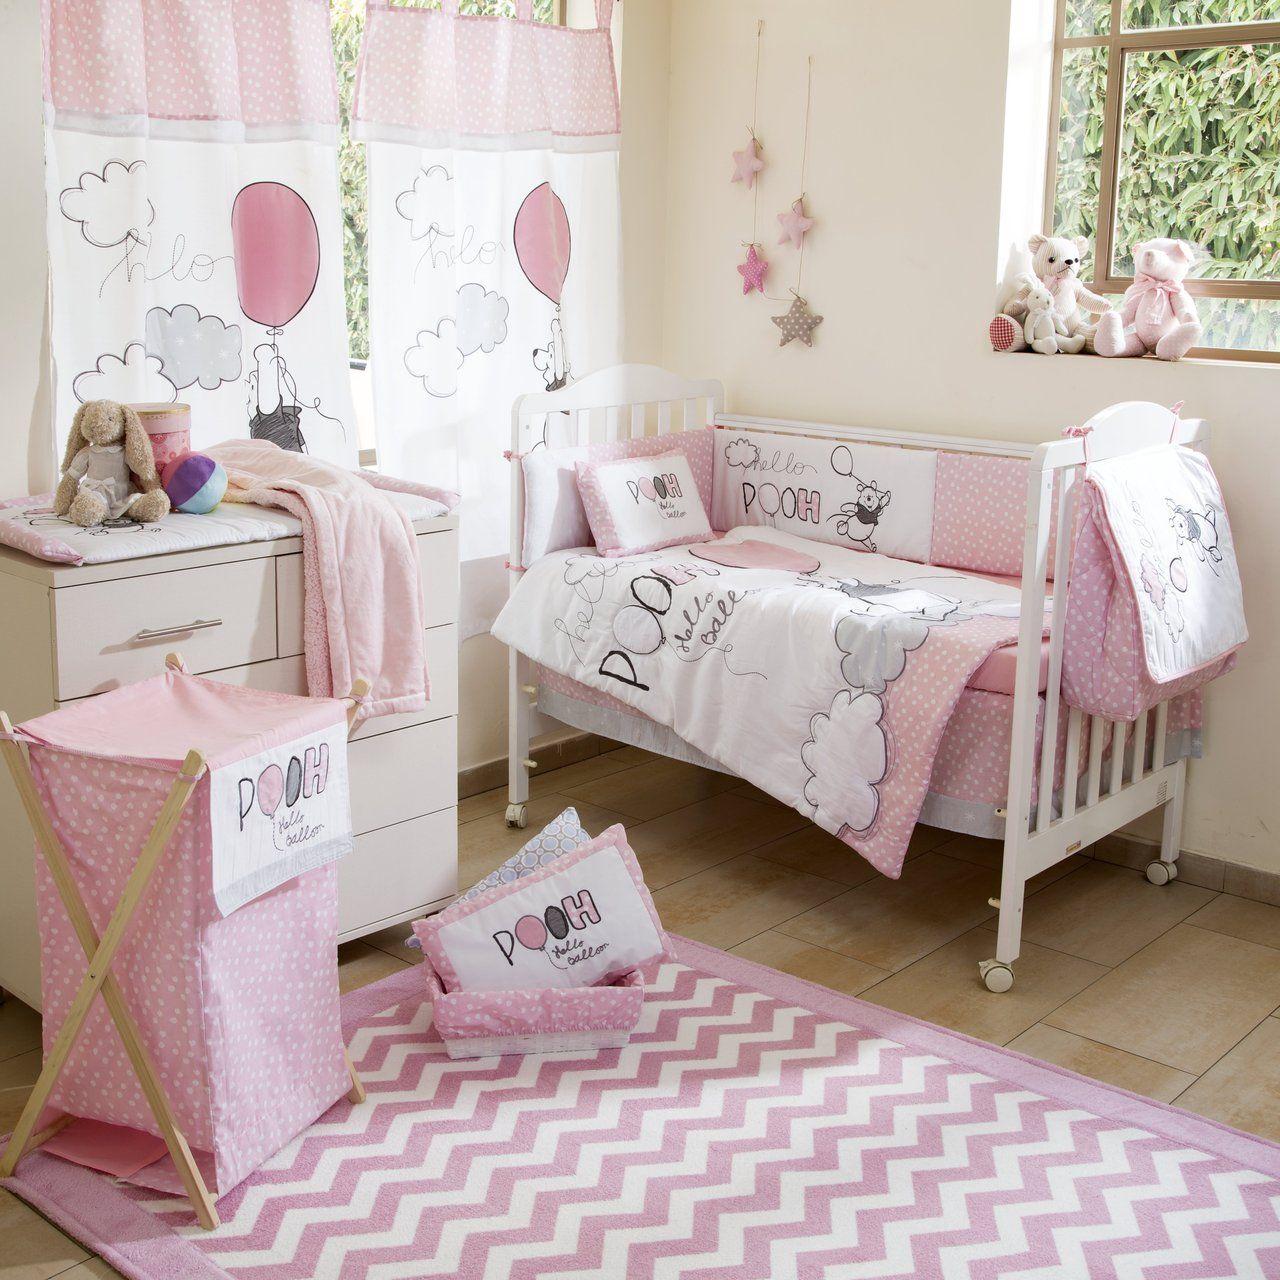 Disney Pink Winnie The Pooh Play Crib Bedding Set Baby Bed Baby